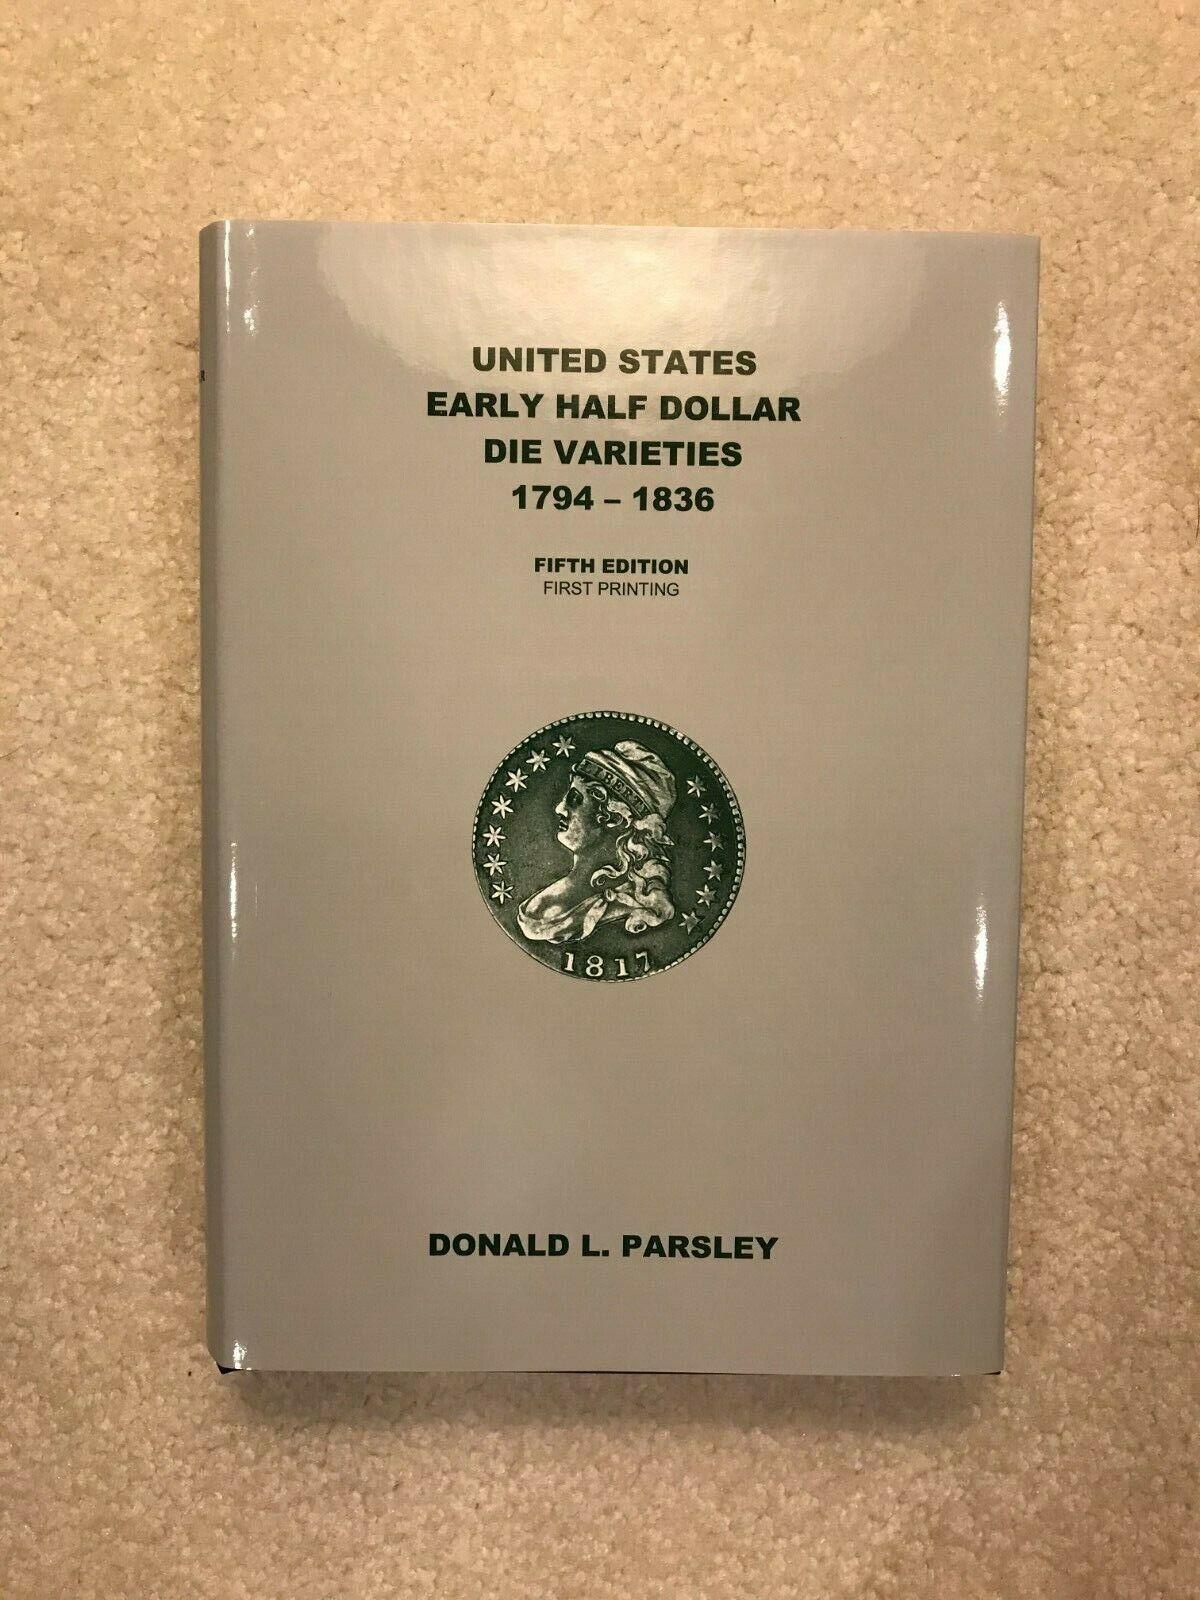 Early Half Dollar Die Varieties 1794-1836 And Top 100 R-4 R-5 2 NEW Books - $40.00